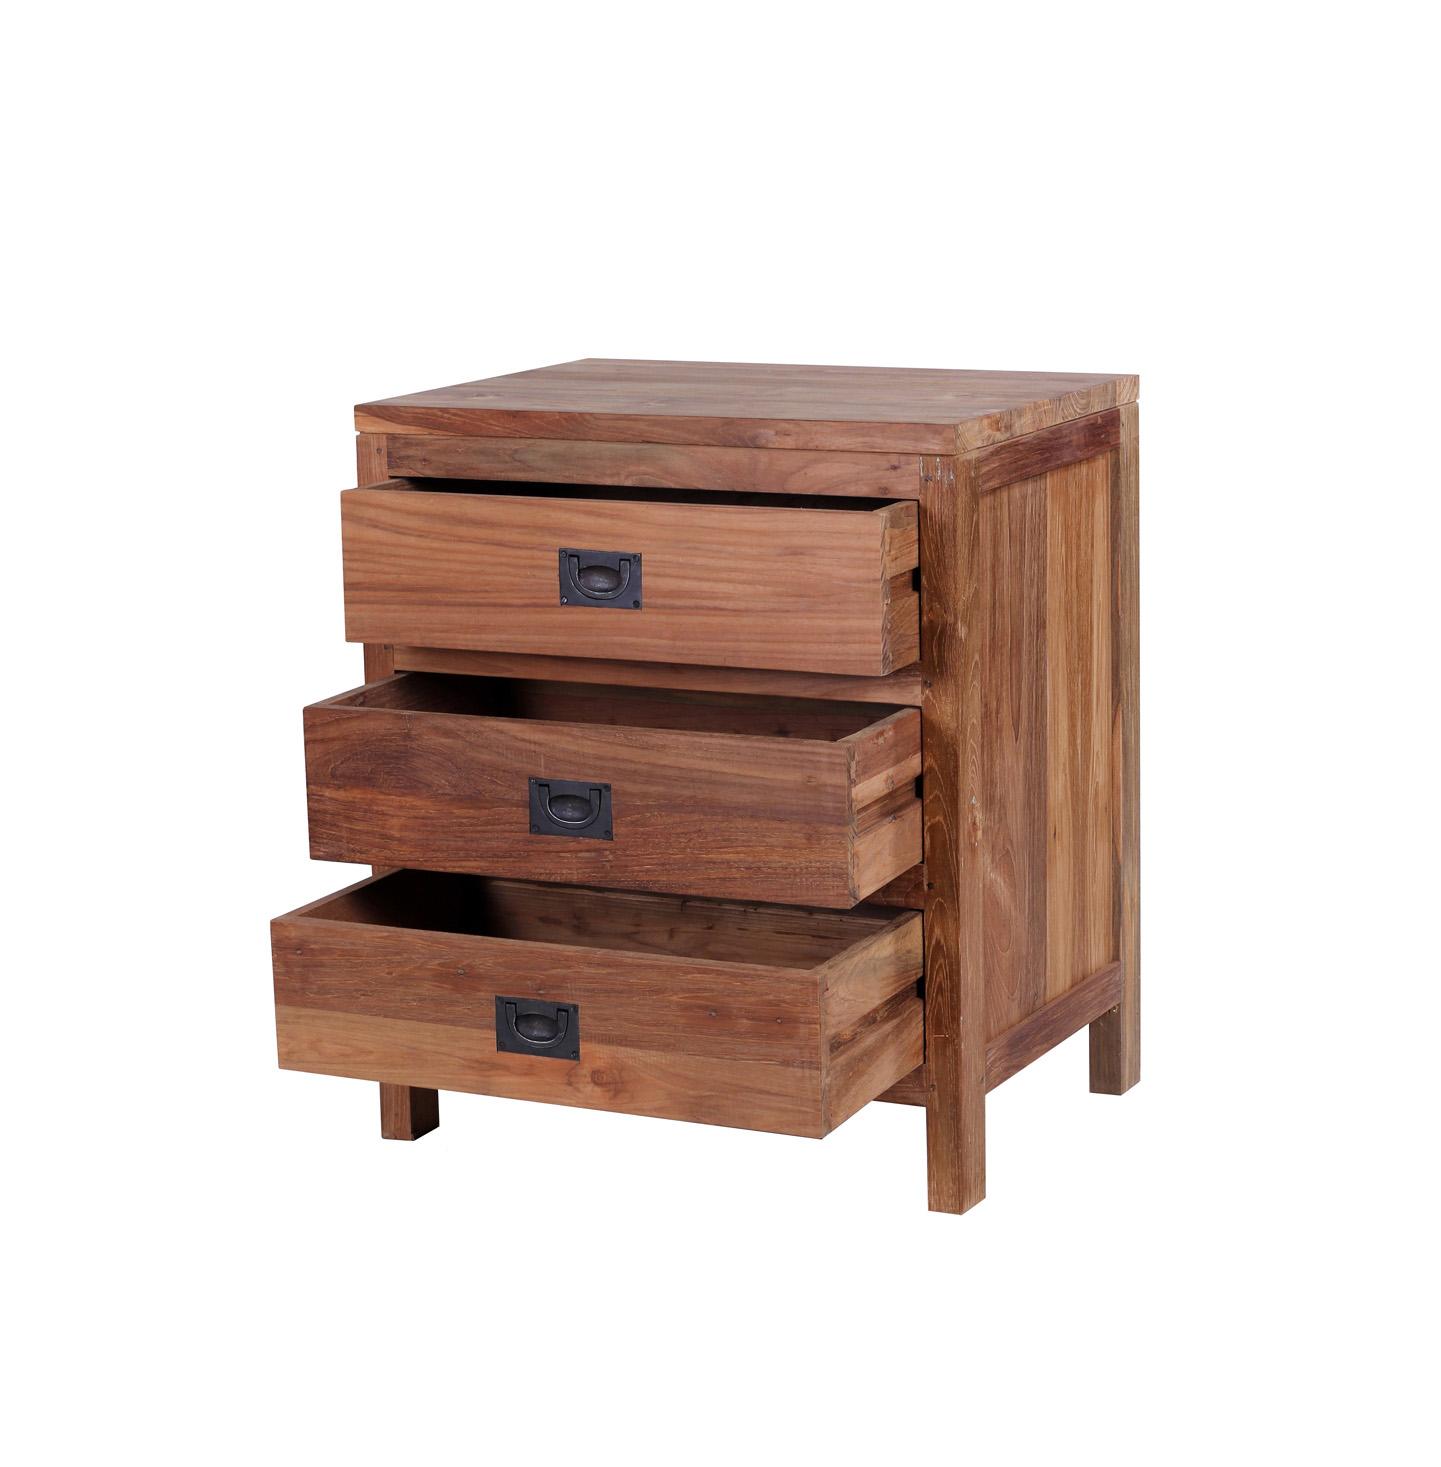 Beleke reclaimed wood bedside table